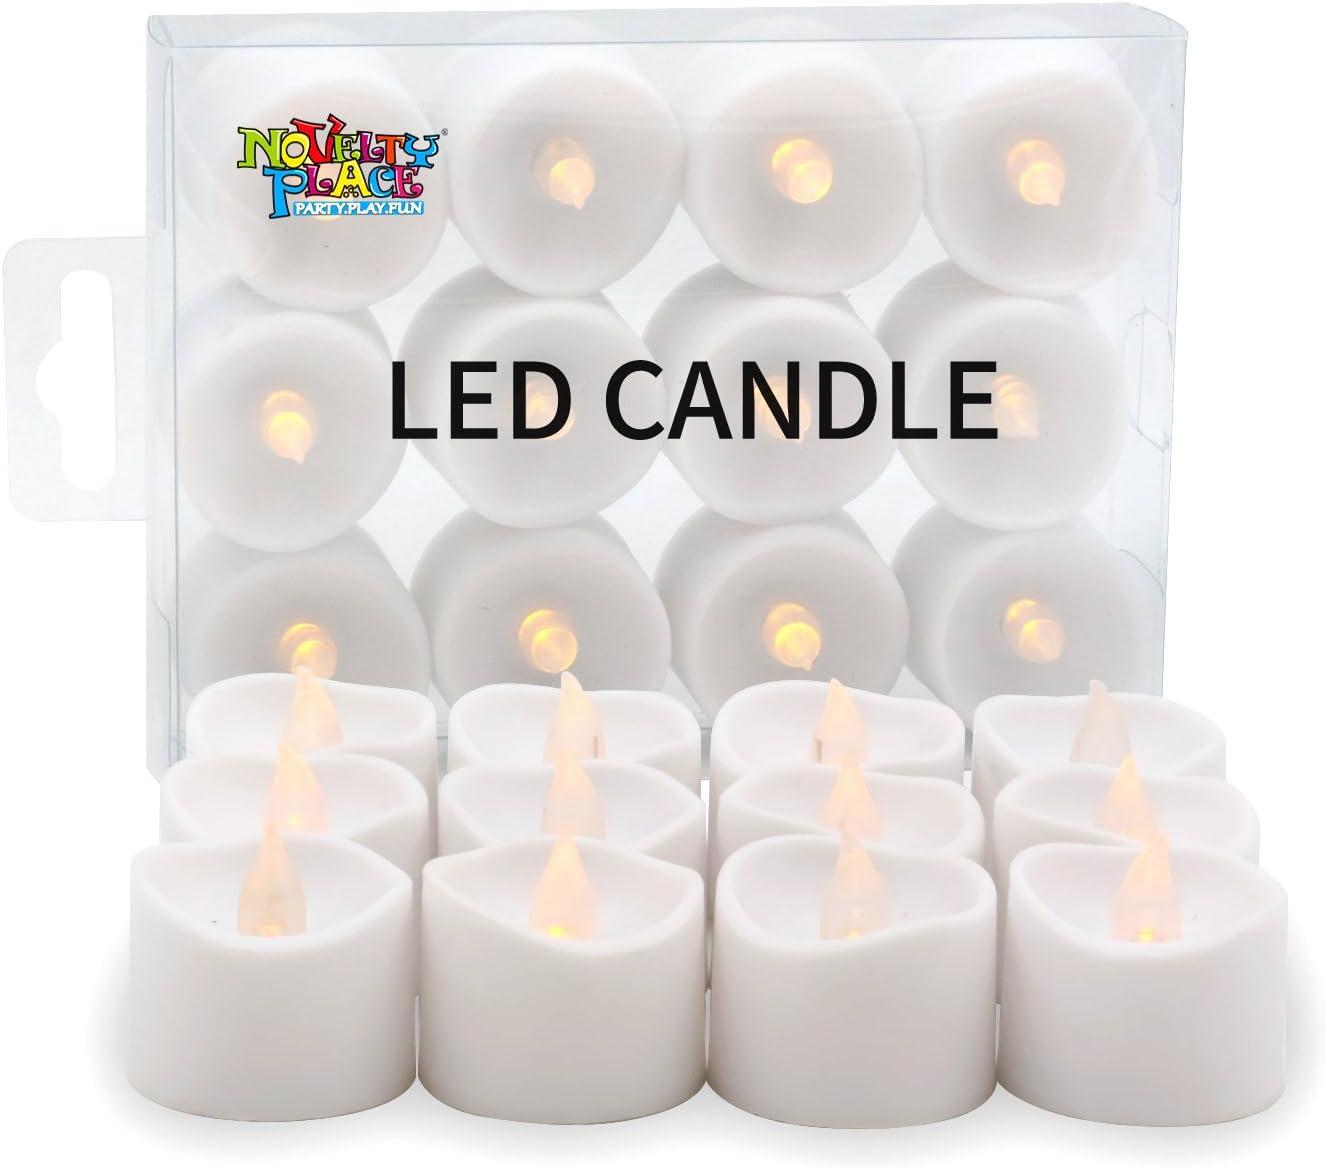 Pack de 12 Novelty Place M/ás Larga bater/ía de Larga Operado El Parpadeo del LED sin Llama votiva Velas